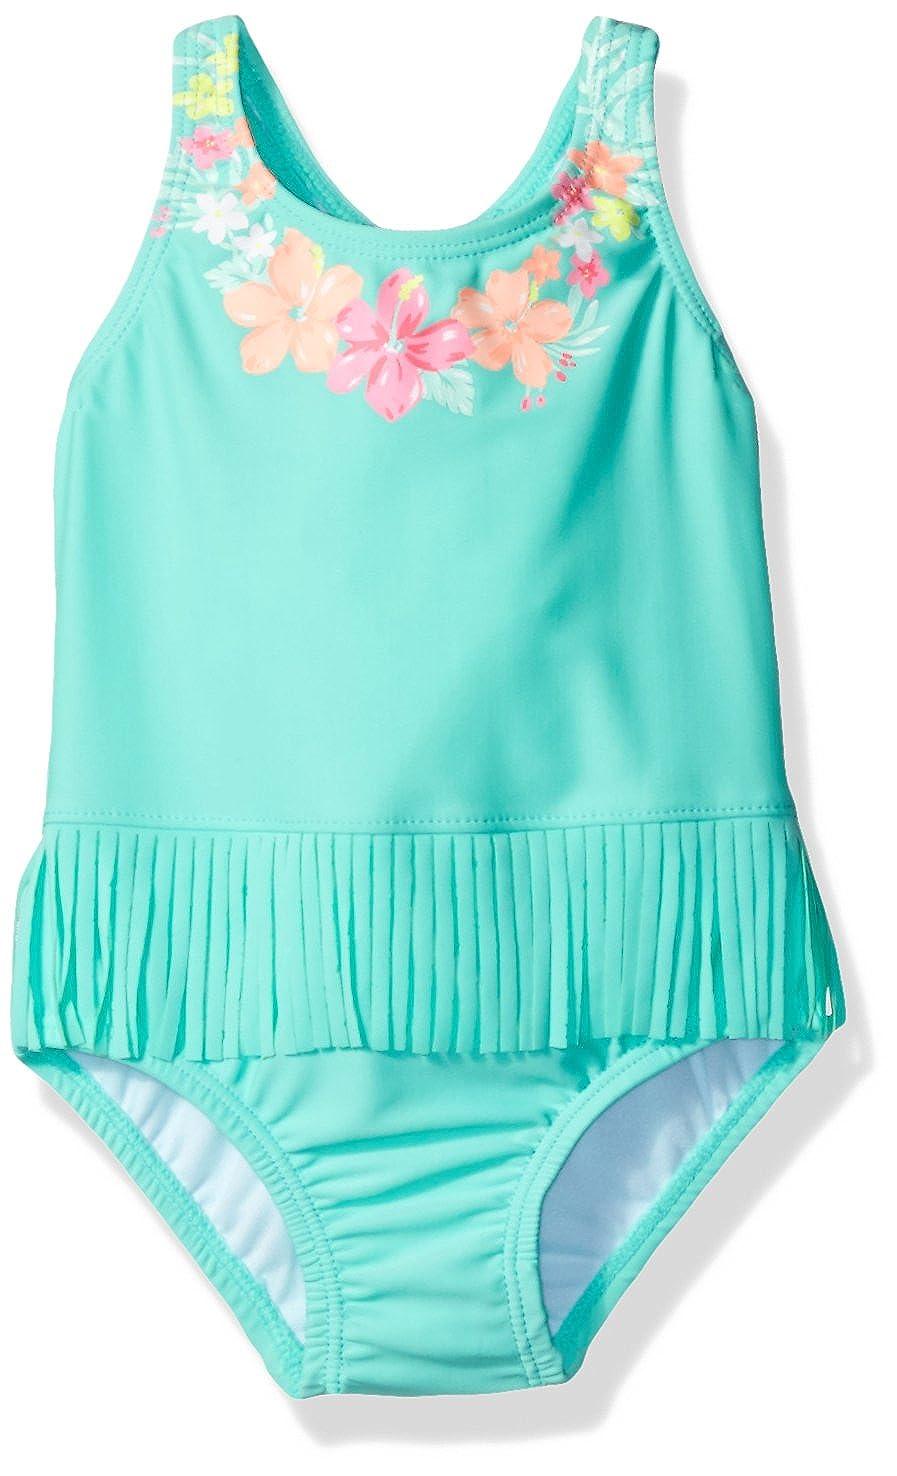 27d6ba81d Amazon.com: Carter's Baby Girls' Hula One Piece Swimsuit, Green, 12 Months:  Clothing